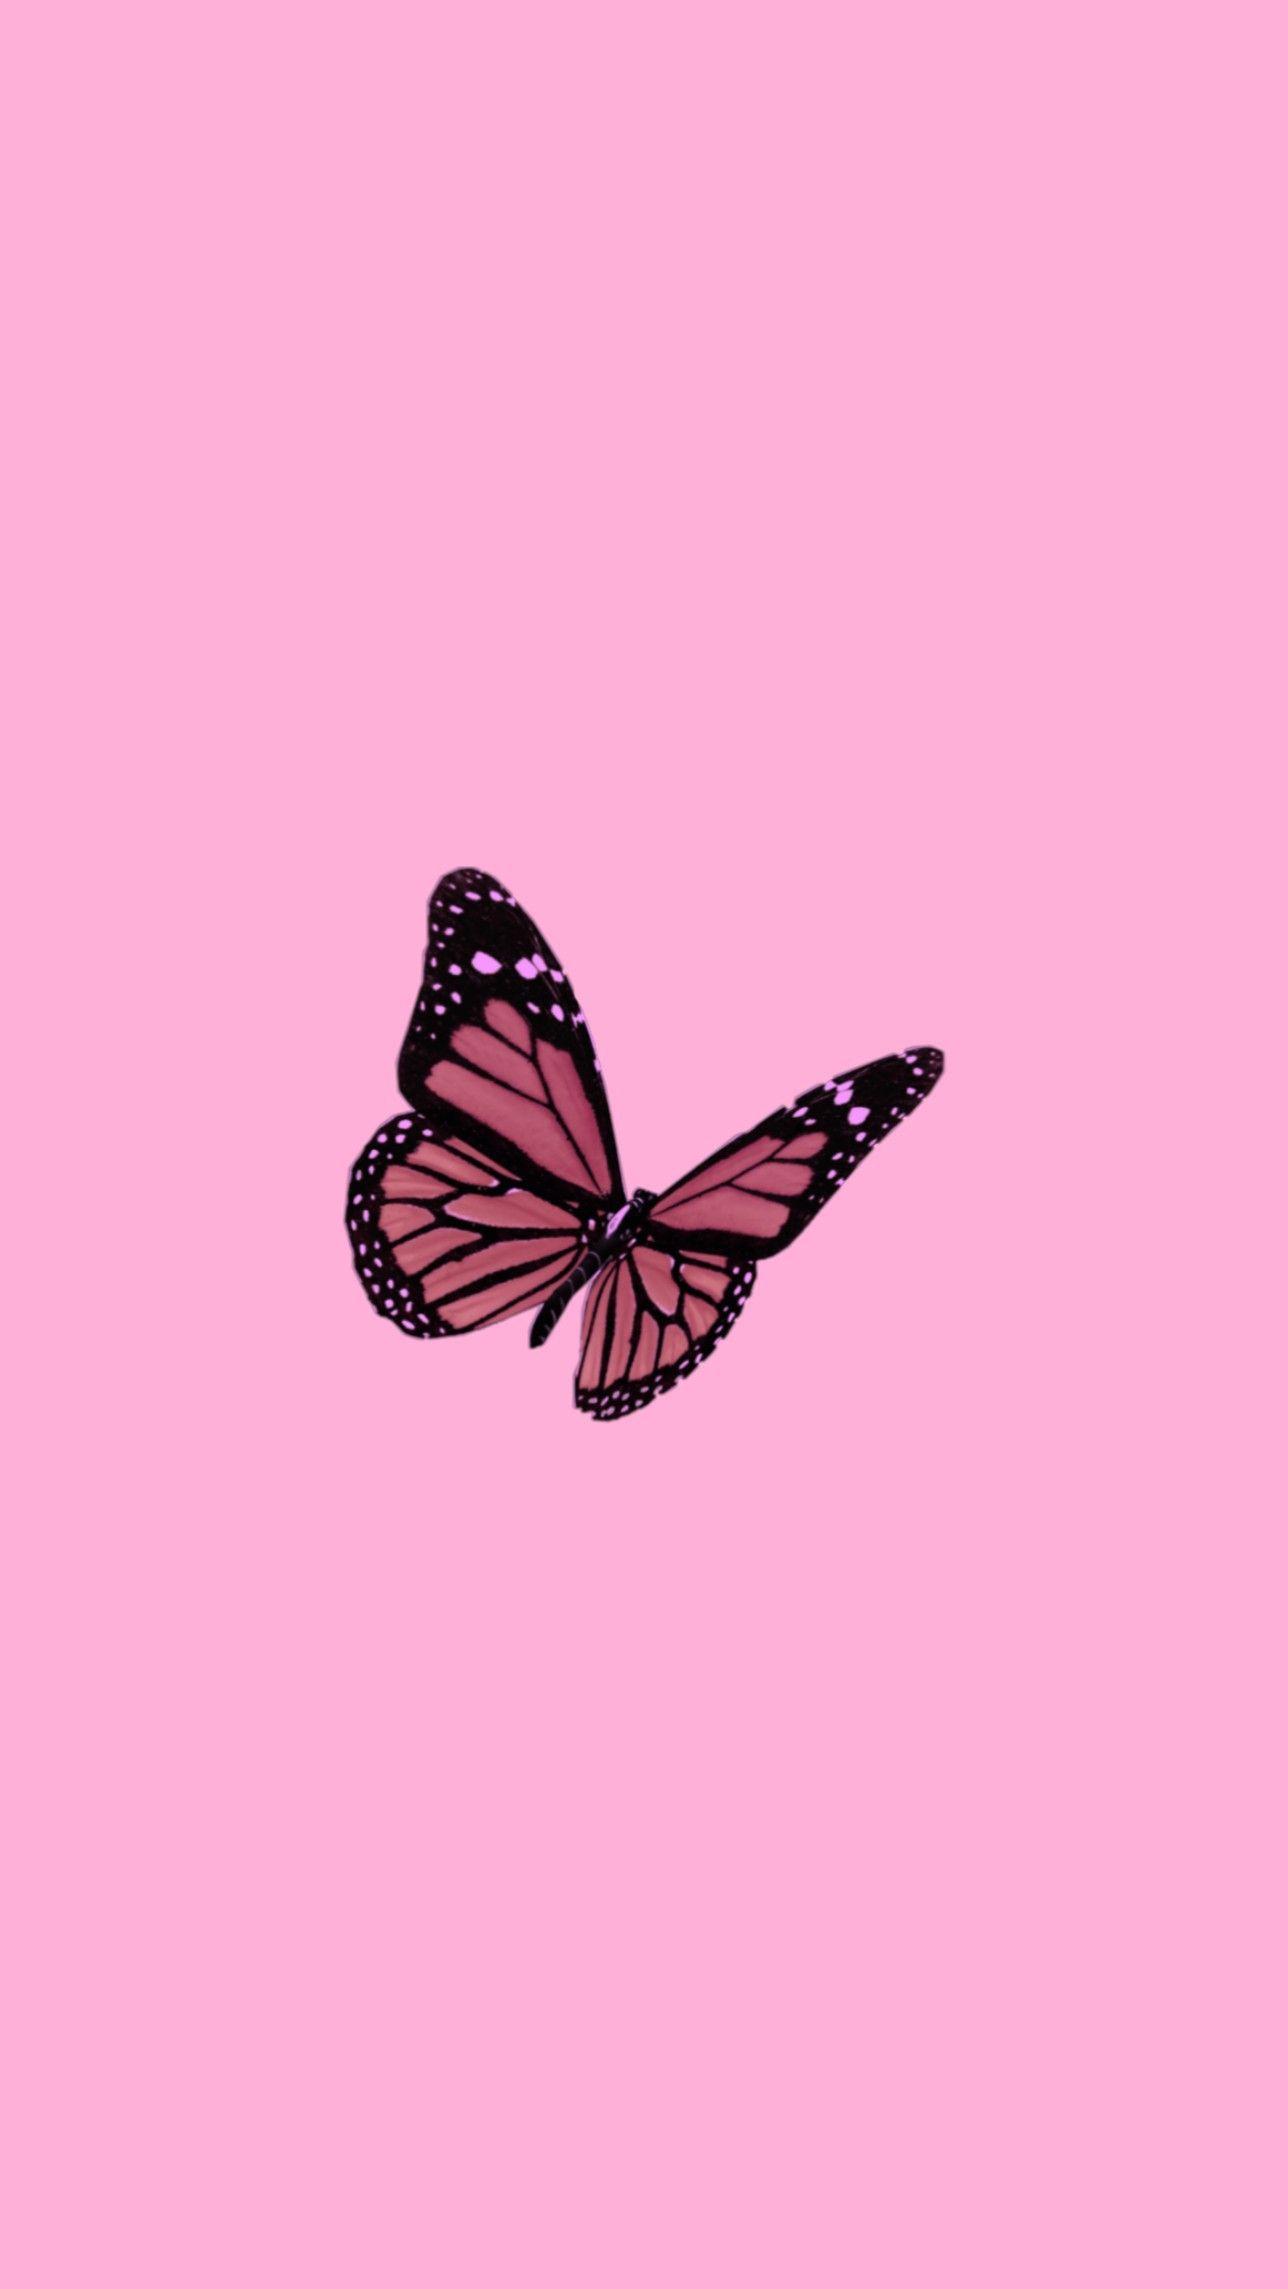 Butterfly Wallpaper Butterfly Wallpaper Iphone Aesthetic Iphone Wallpaper Butterfly Wallpaper